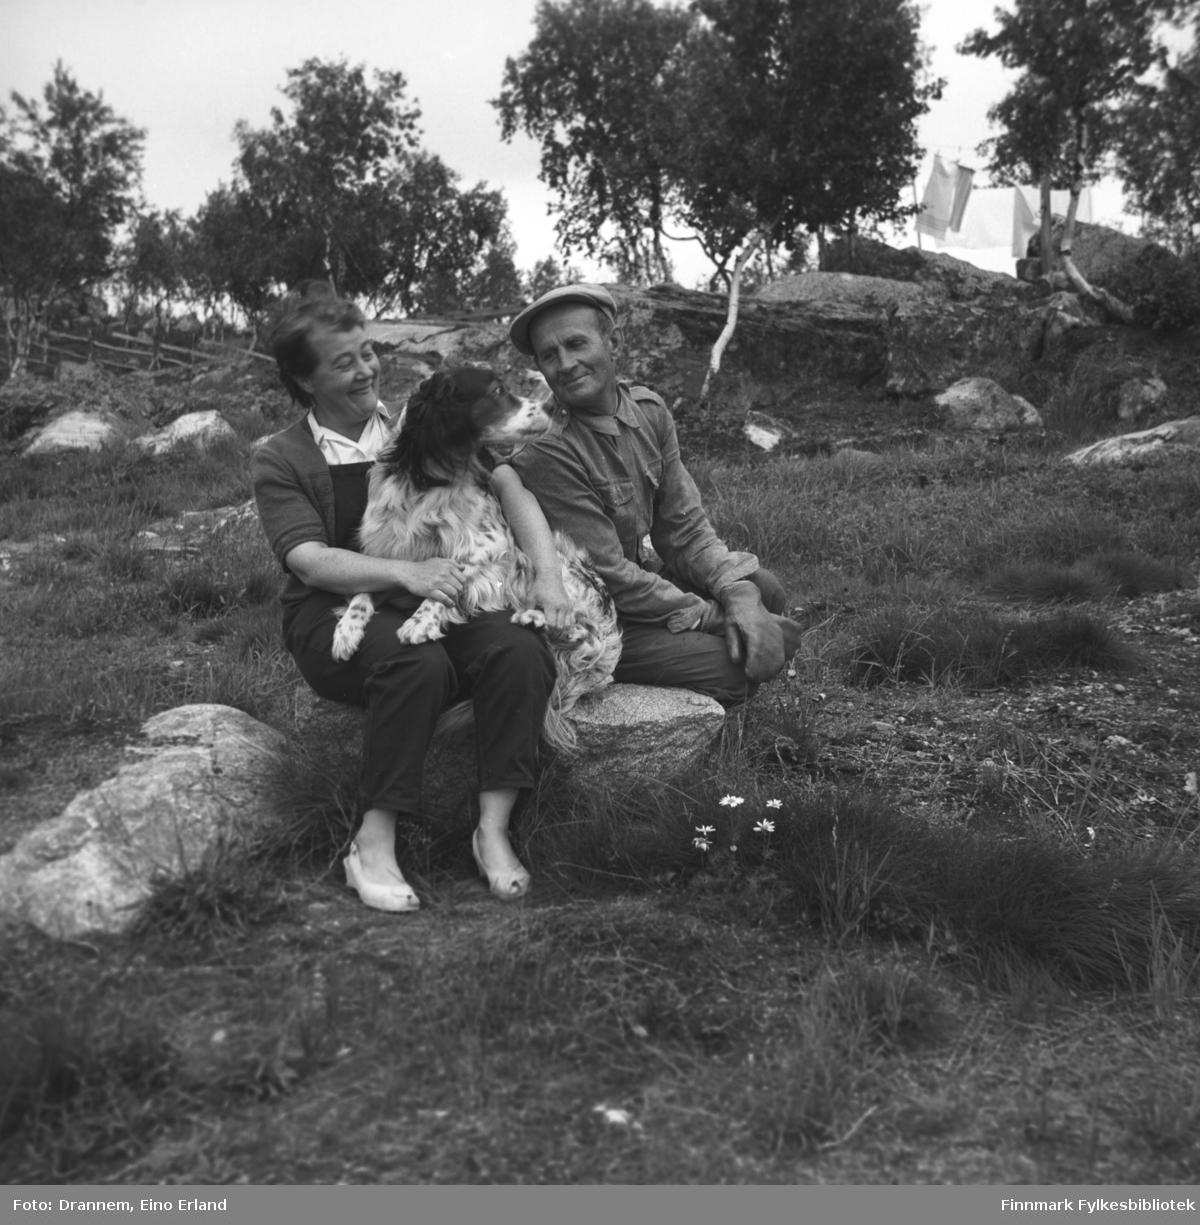 Sonja og Uuno Lappalainen sitter på en stein på gårdstunet med hunden Rexi på fanget.